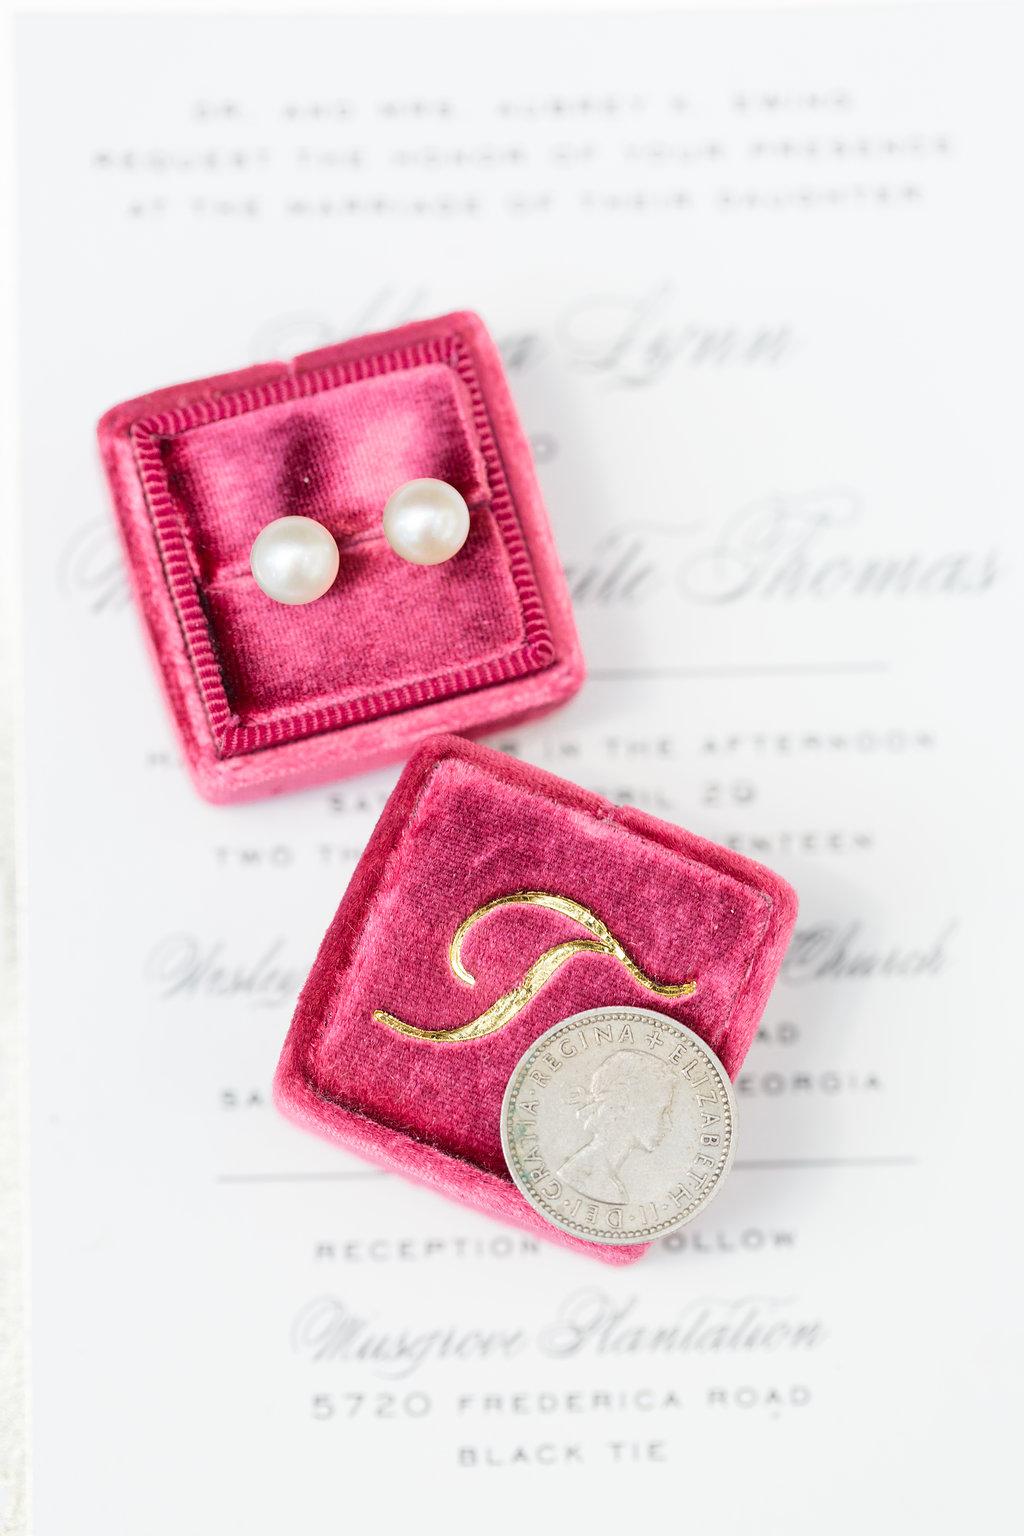 Pearl Bridal Earrings - Musgrove Plantation Georgia Wedding Venue